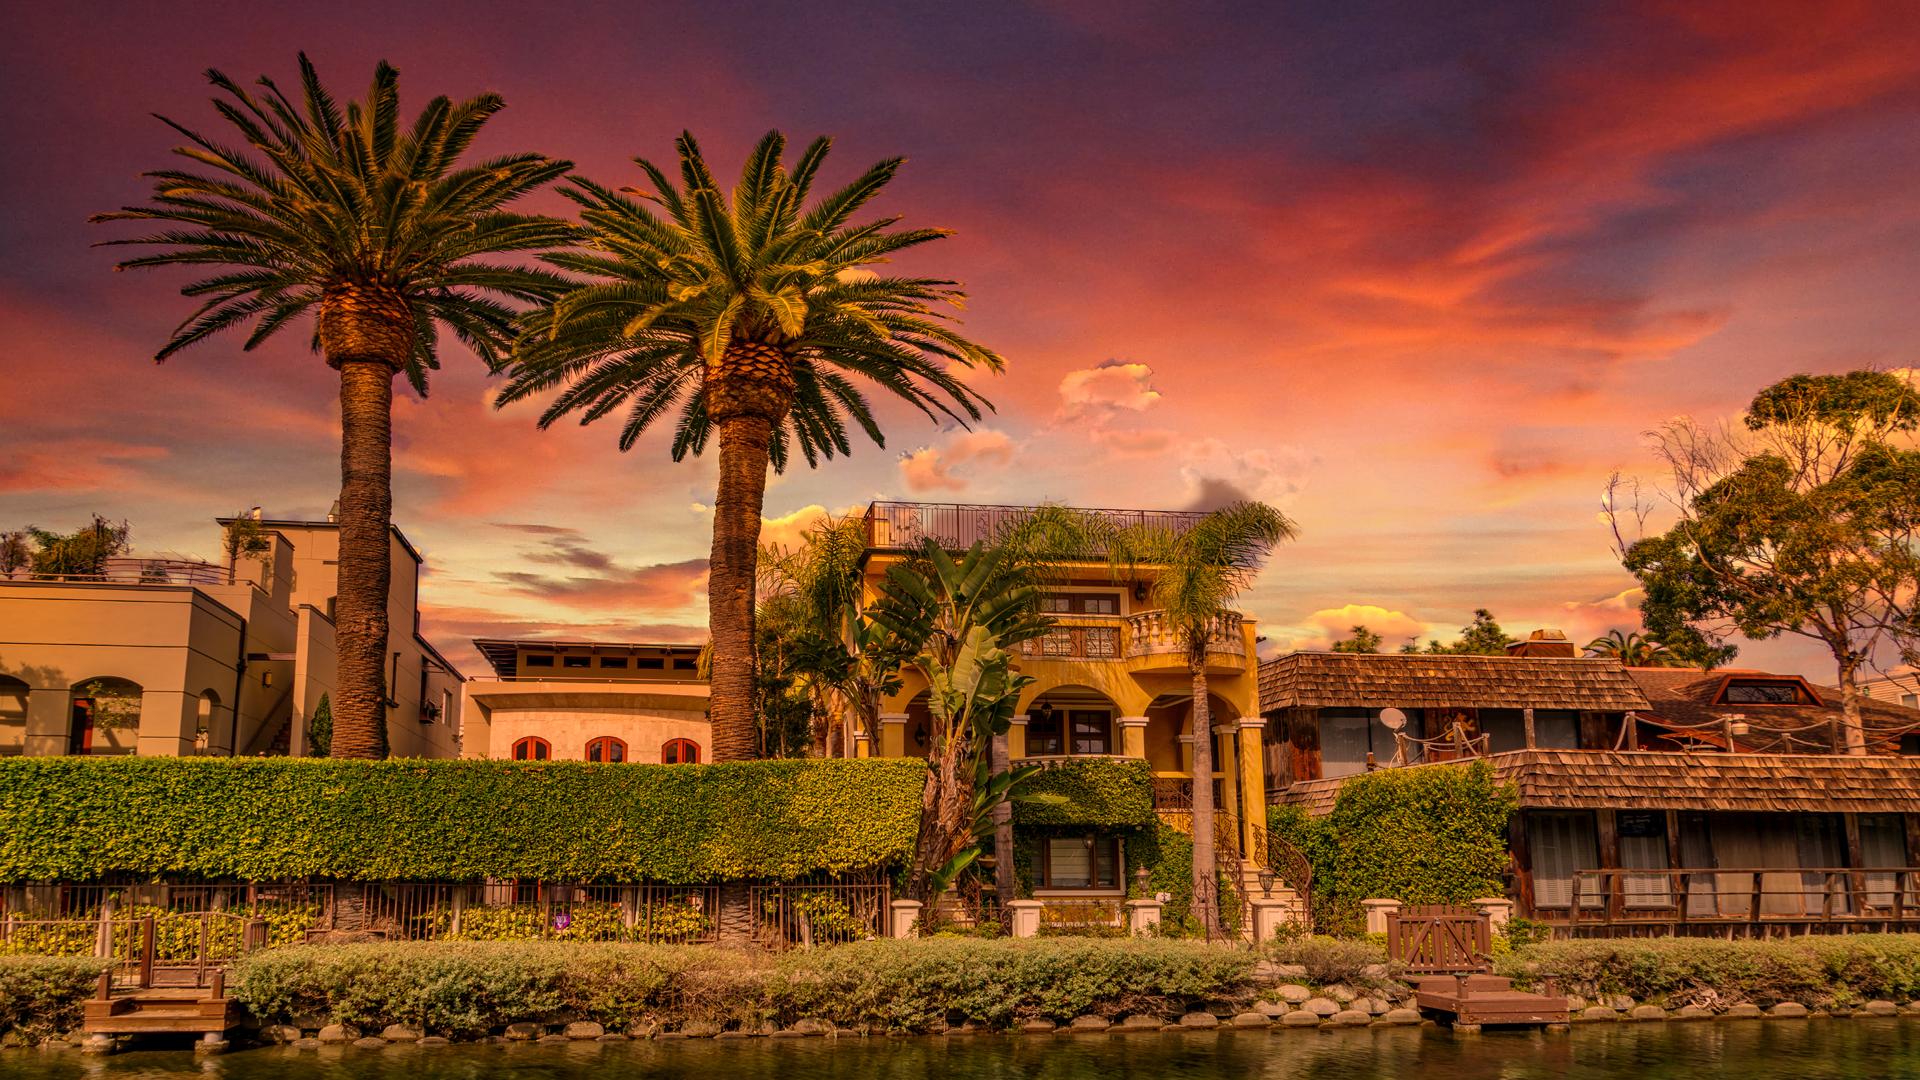 Venice Beach CanalsSunset5 2-14-18